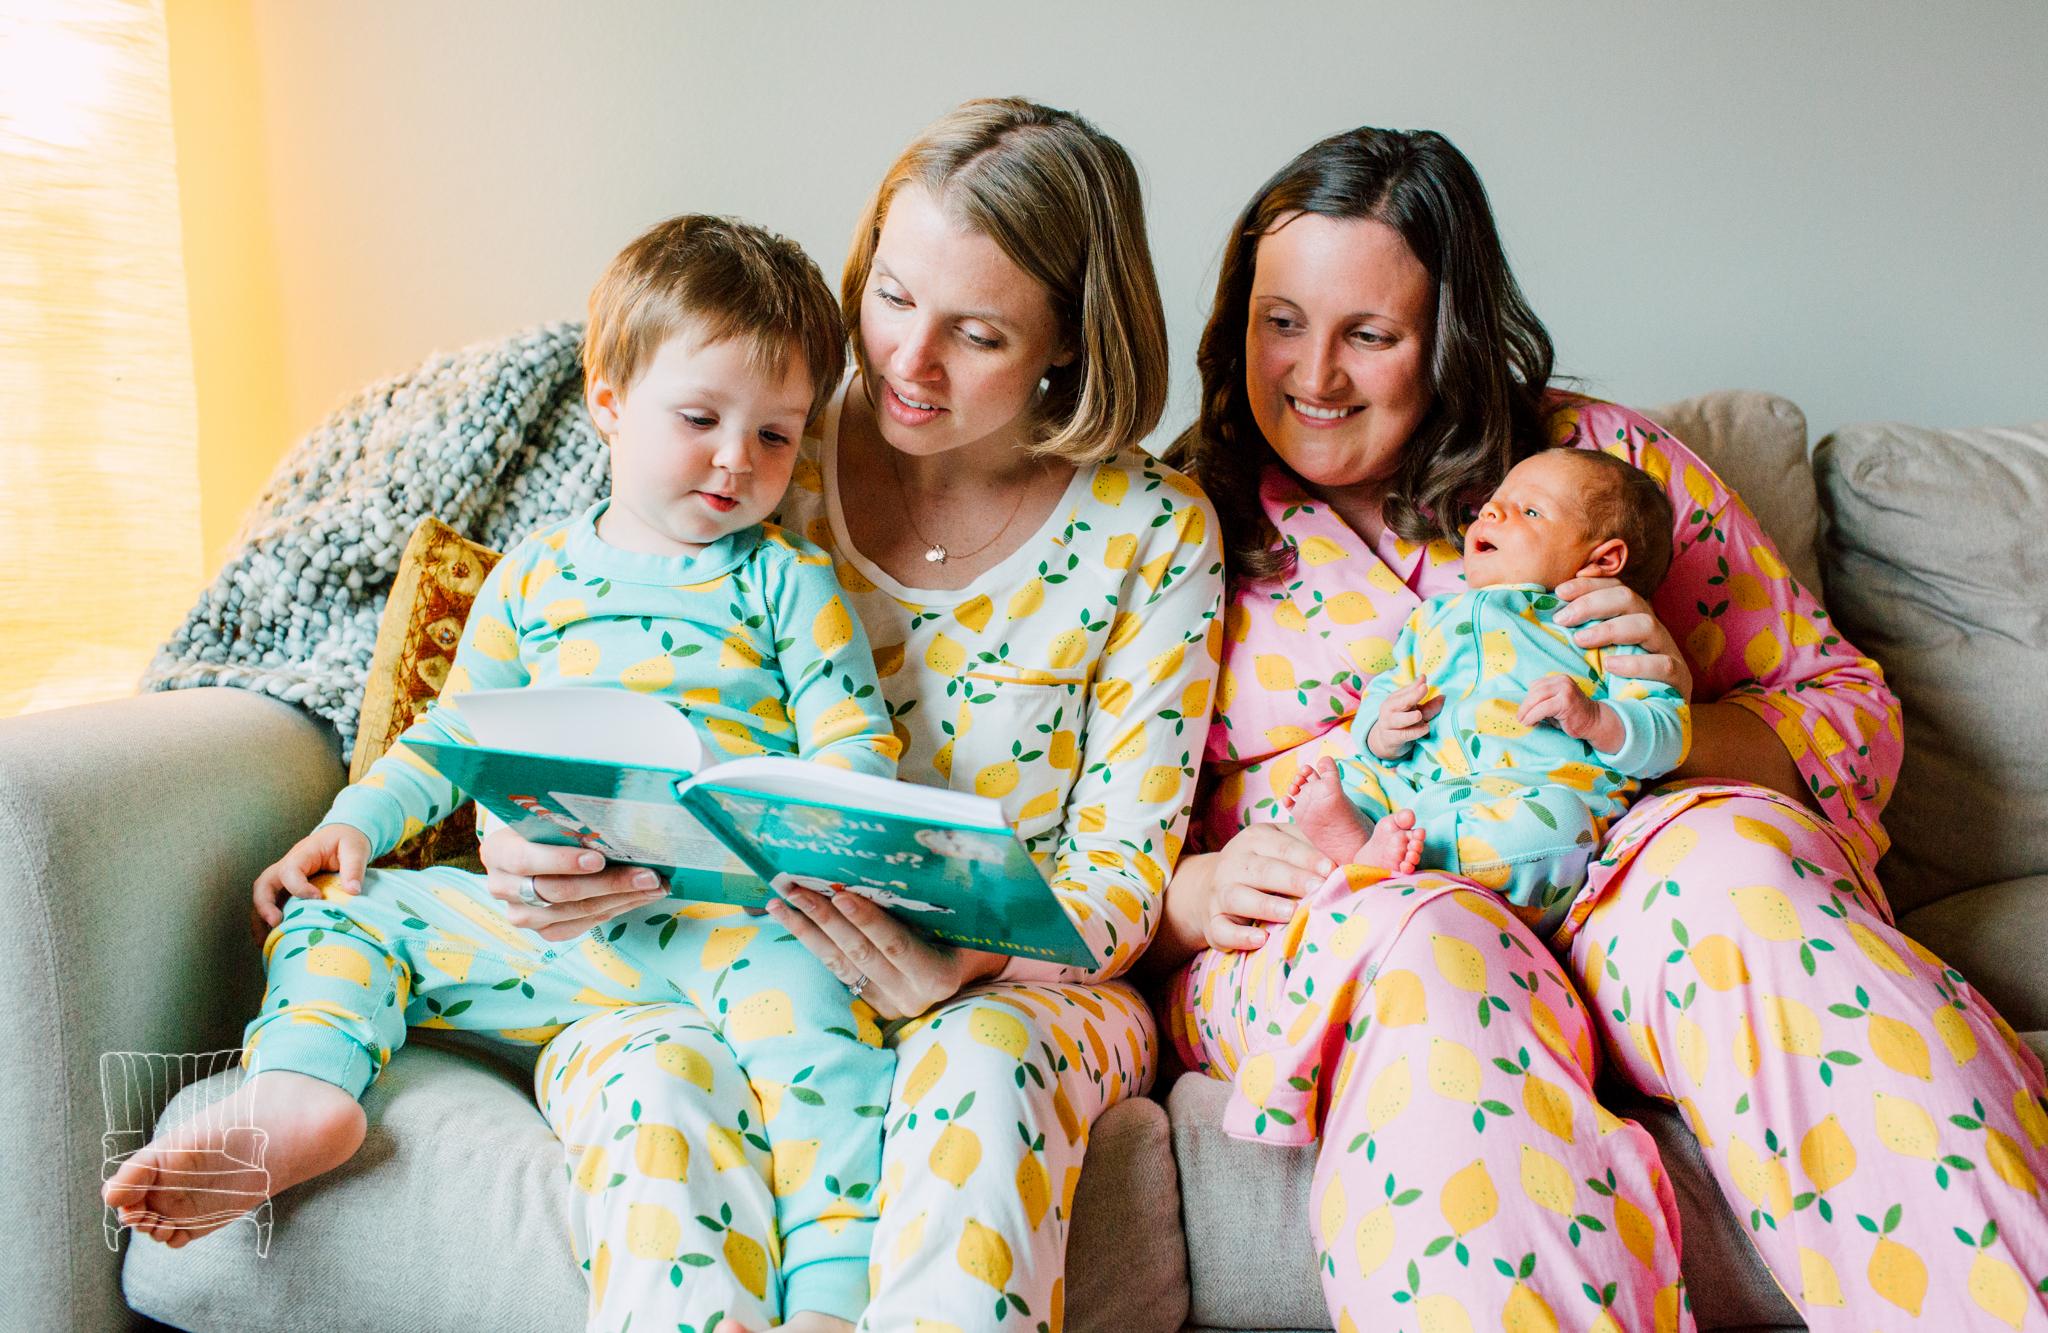 bellingham-newborn-family-photographer-katheryn-moran-photography-baby-harry-10.jpg